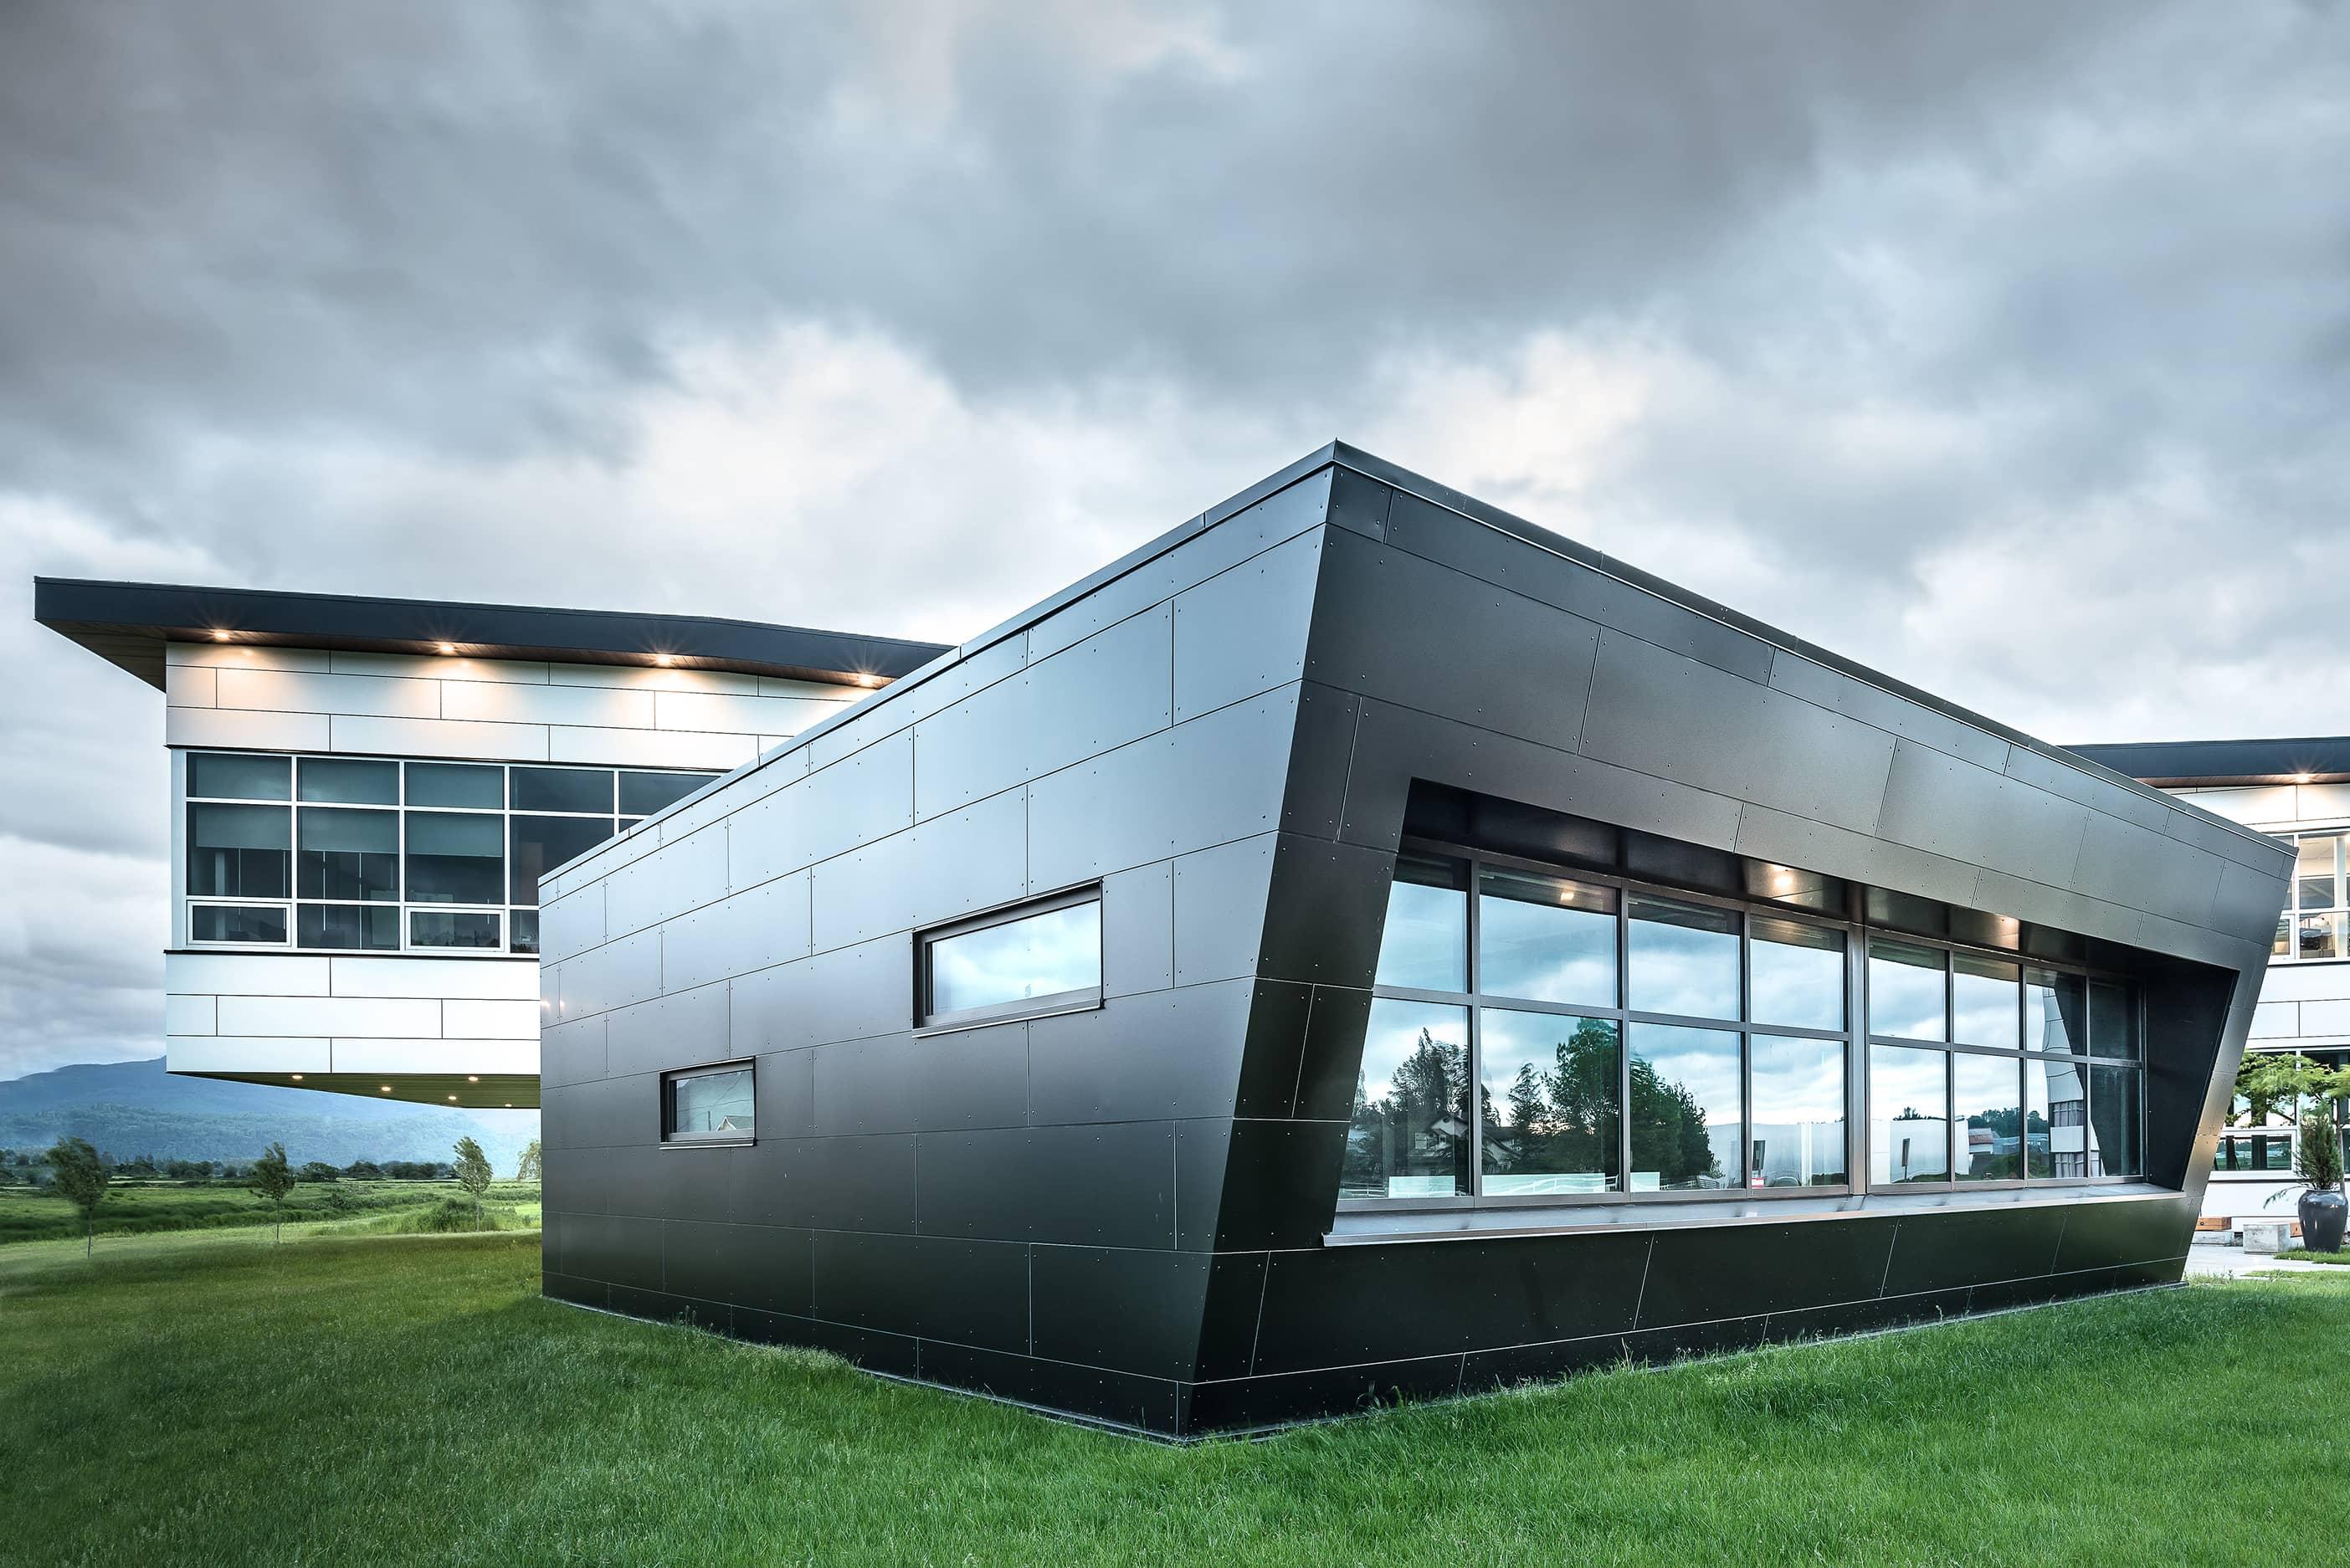 bbp westgen office and laboratory exterior 2